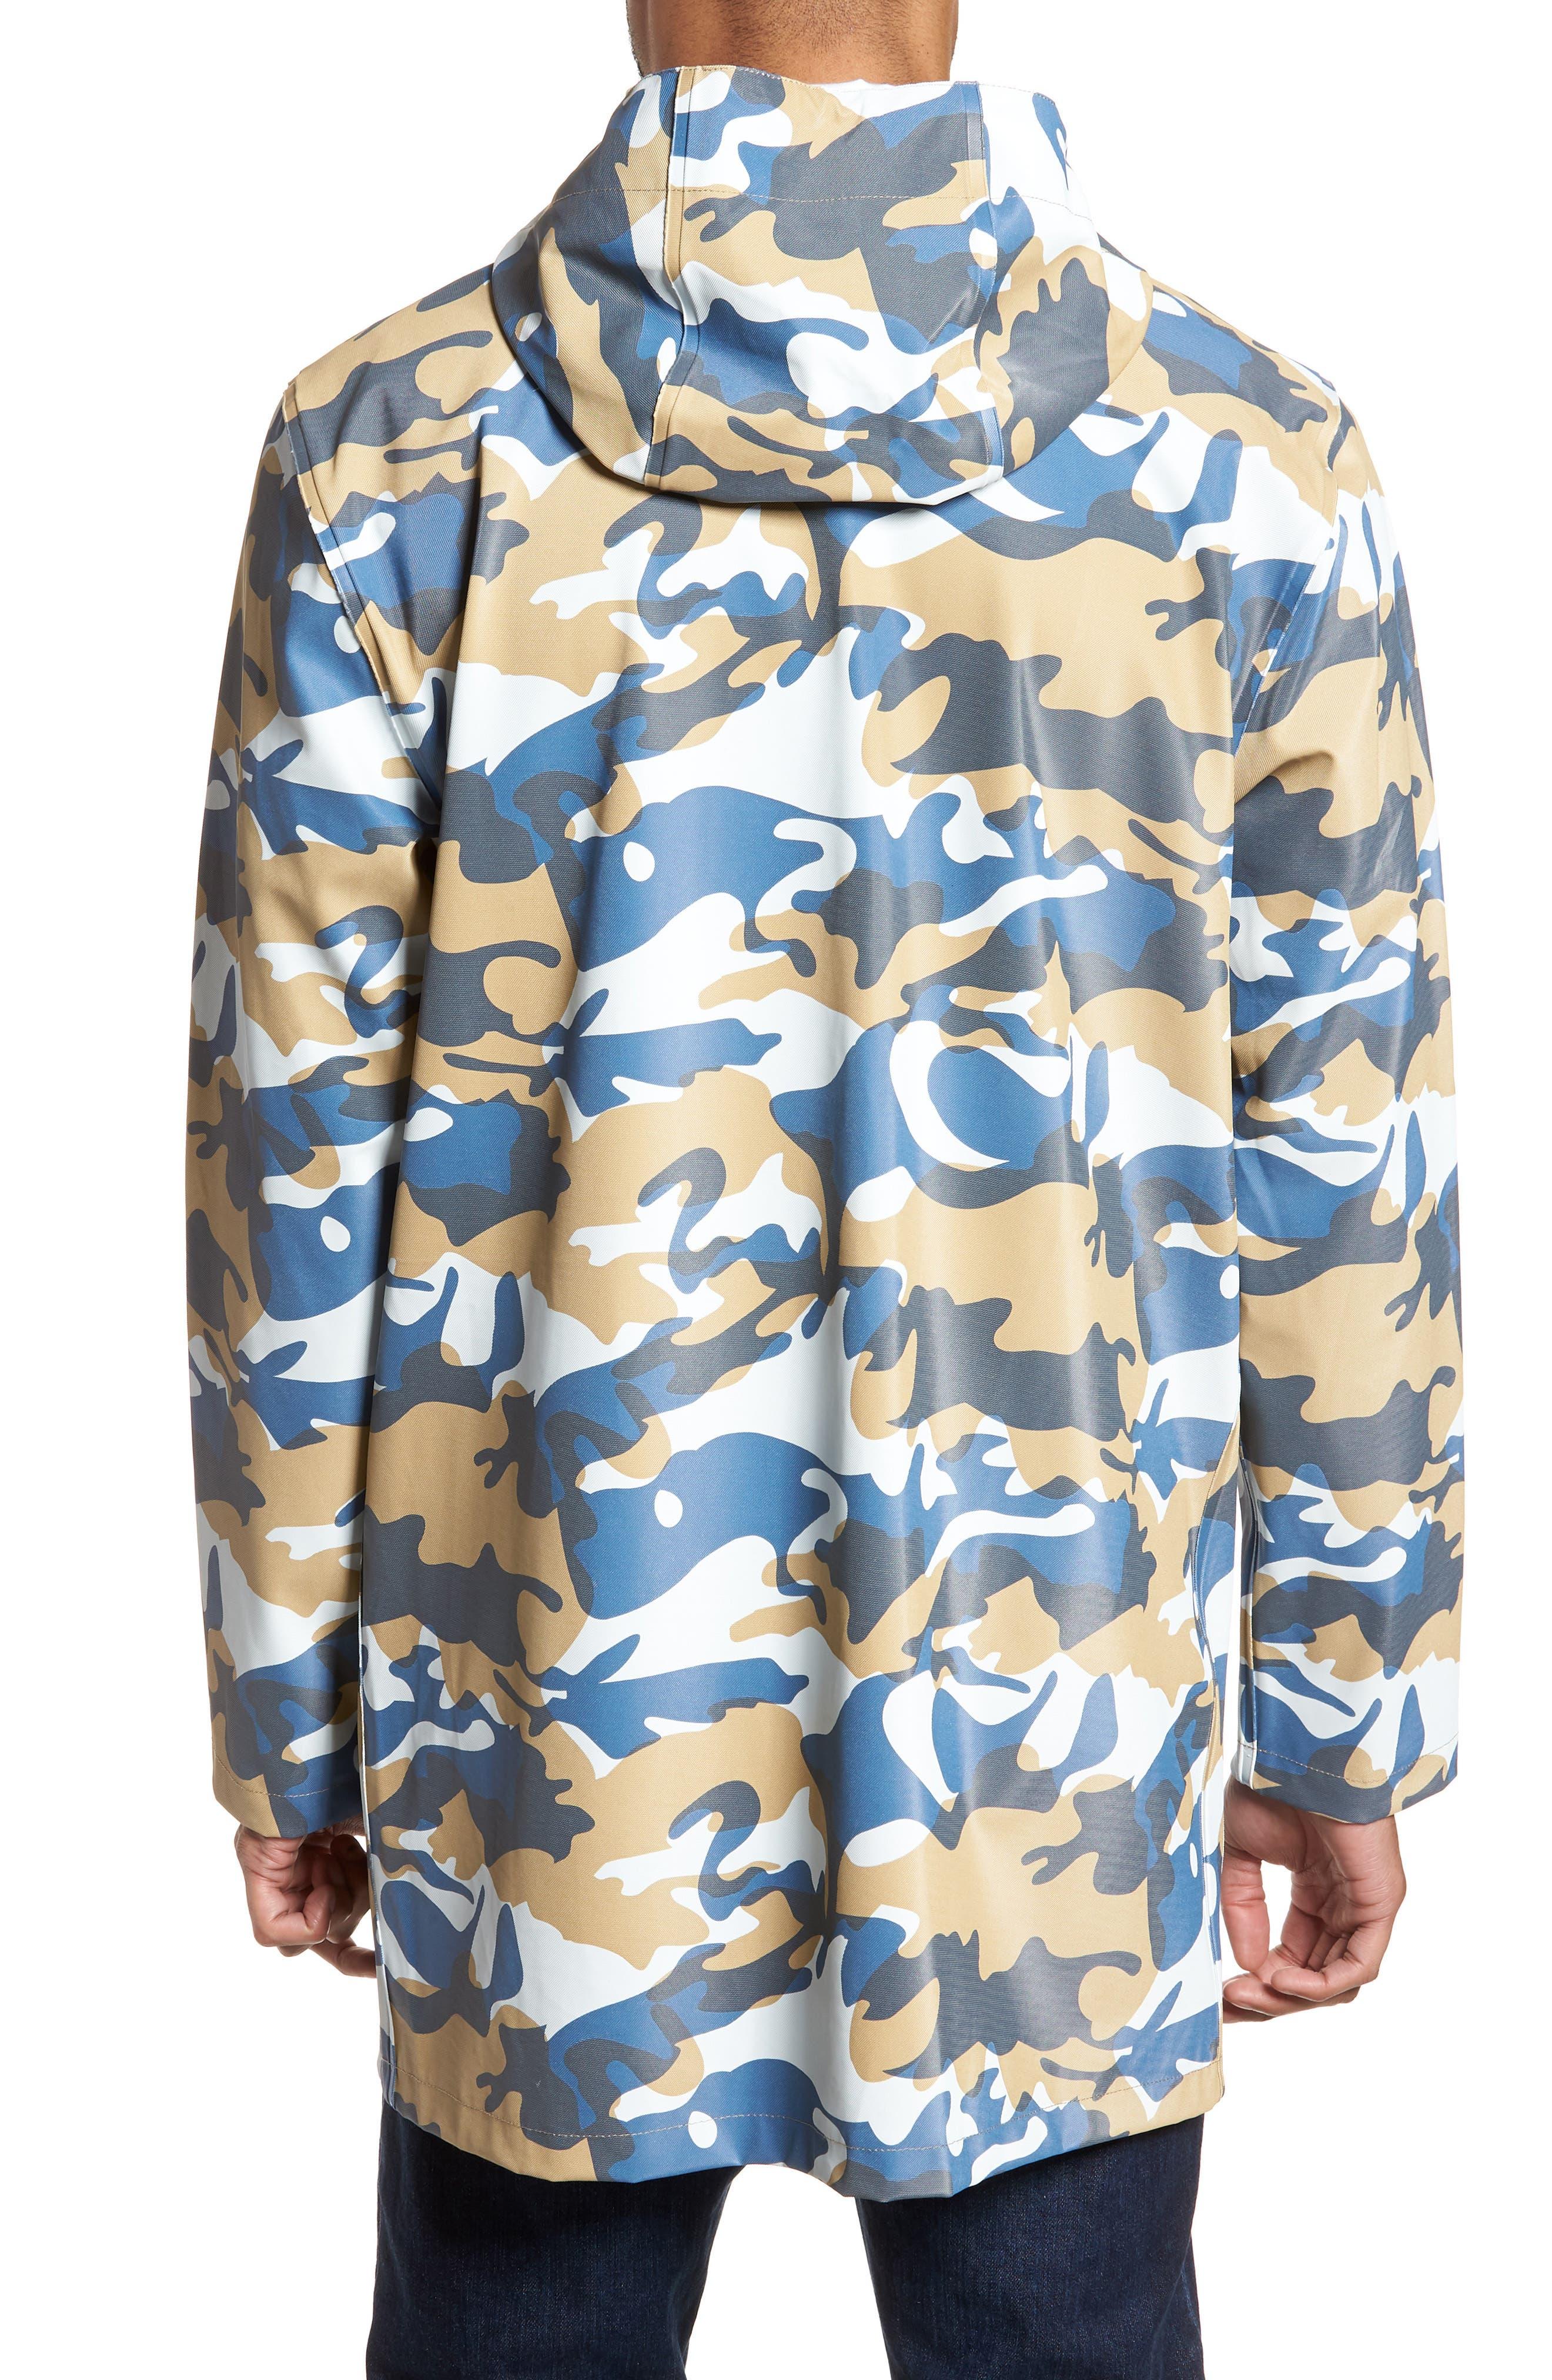 Stockholm Waterproof Hooded Raincoat,                             Alternate thumbnail 2, color,                             Camo